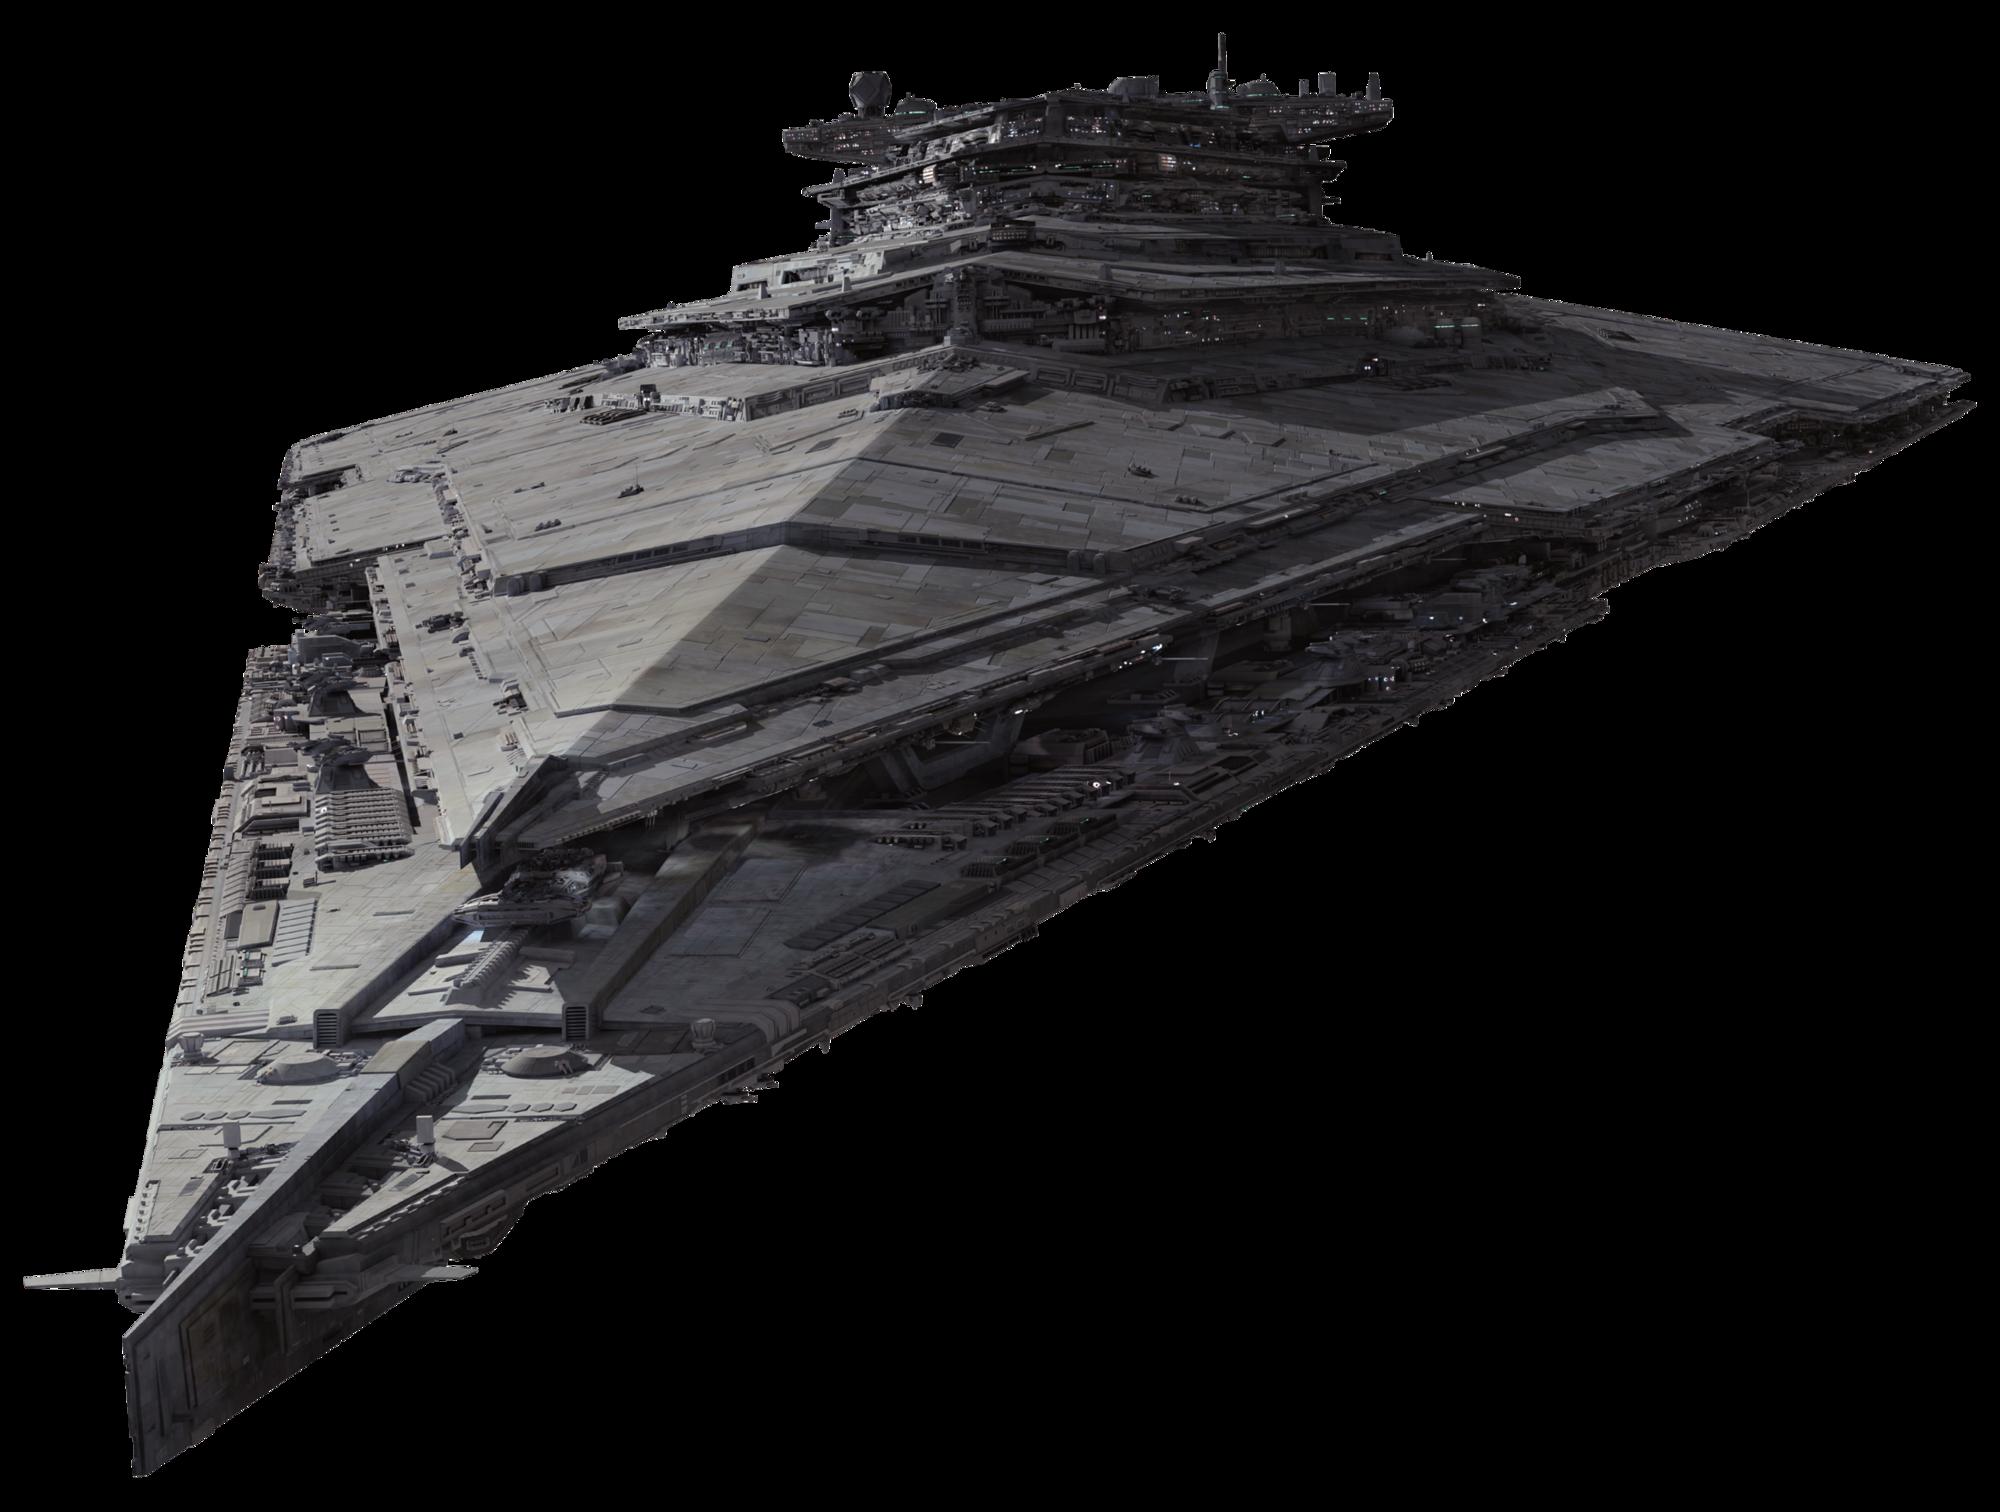 Finalizersd Fathead Png Png Image 2000 1512 Pixels Scaled 46 Star Wars Schiffe Schiff Raumschiff